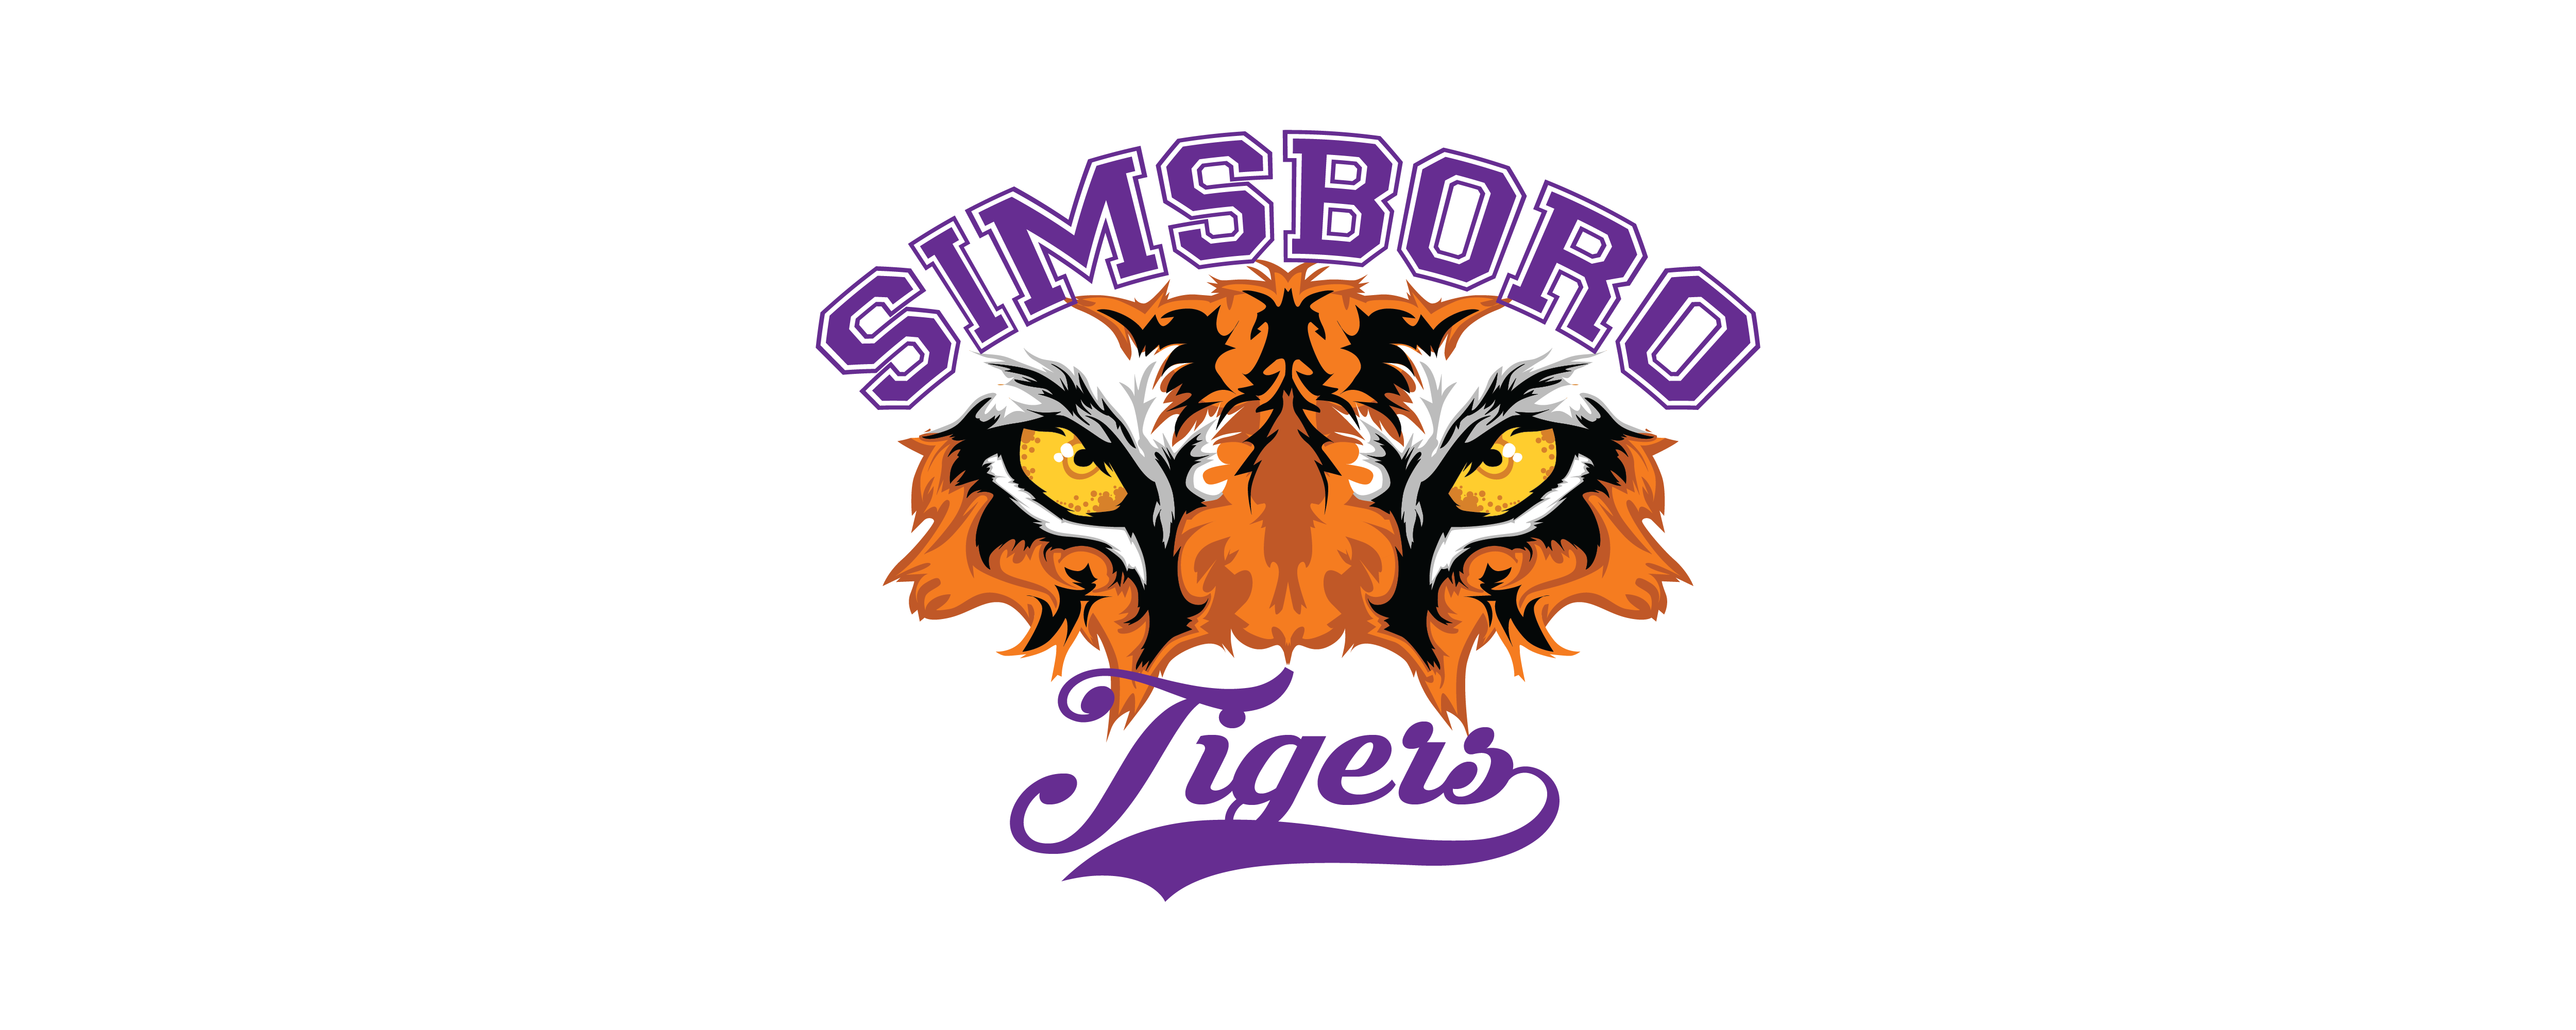 Simsboro Tigers Logo